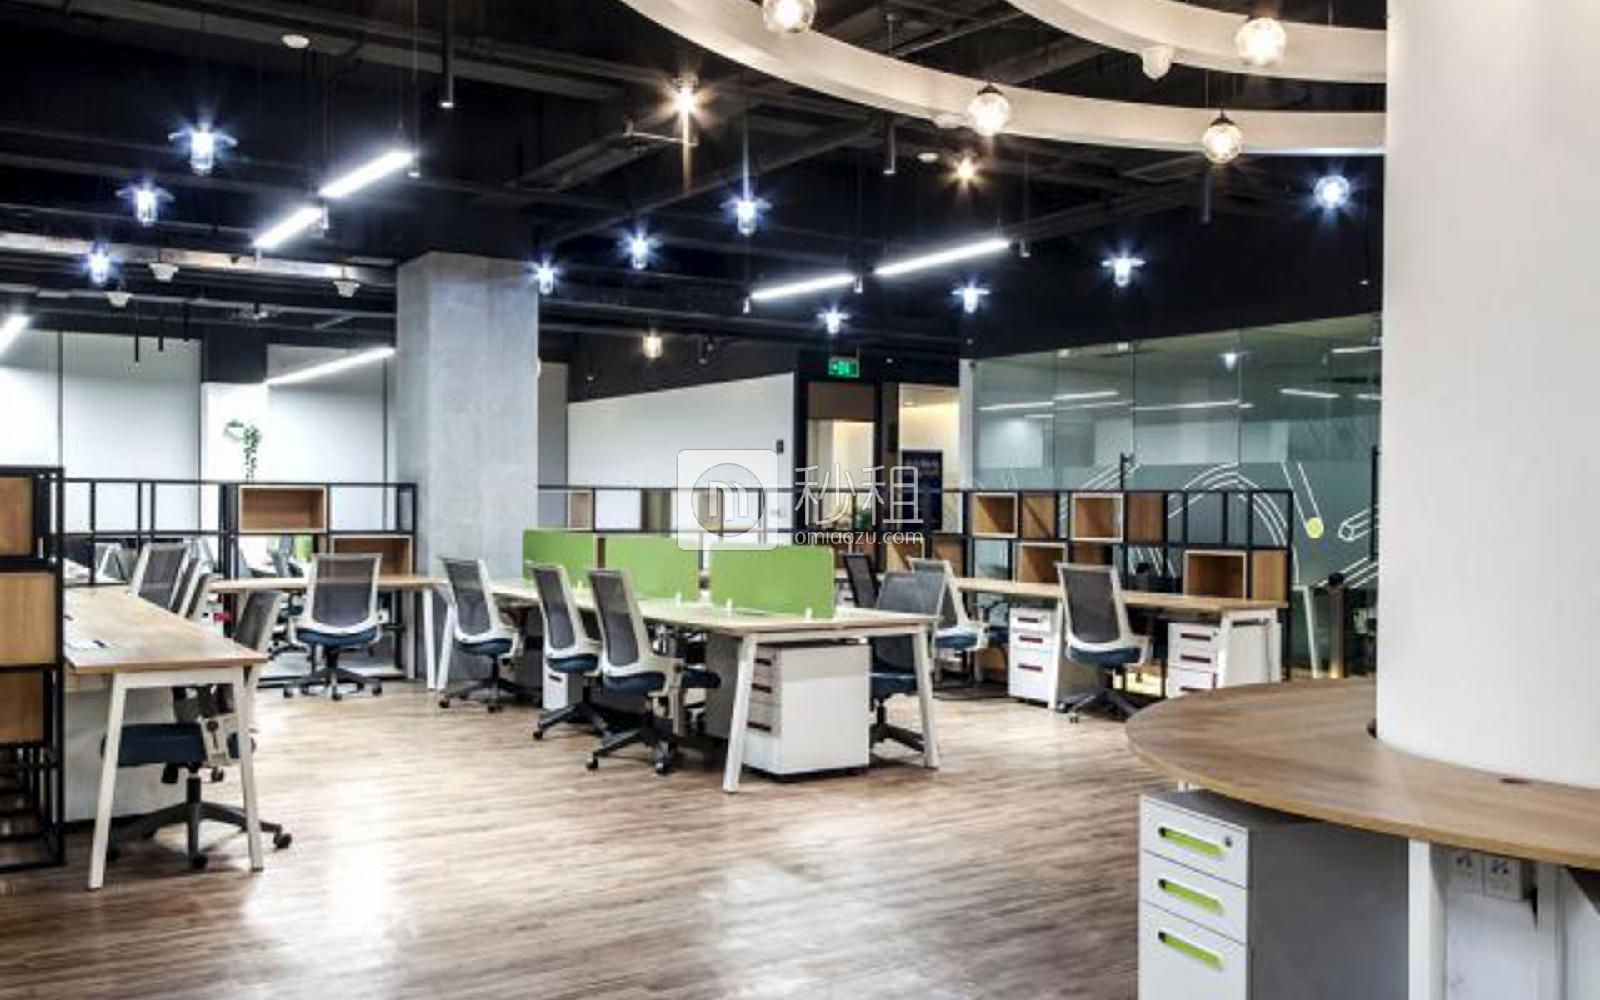 U&P联合工社-新视艺创客公园写字楼出租5平米精装办公室1400元/工位.月